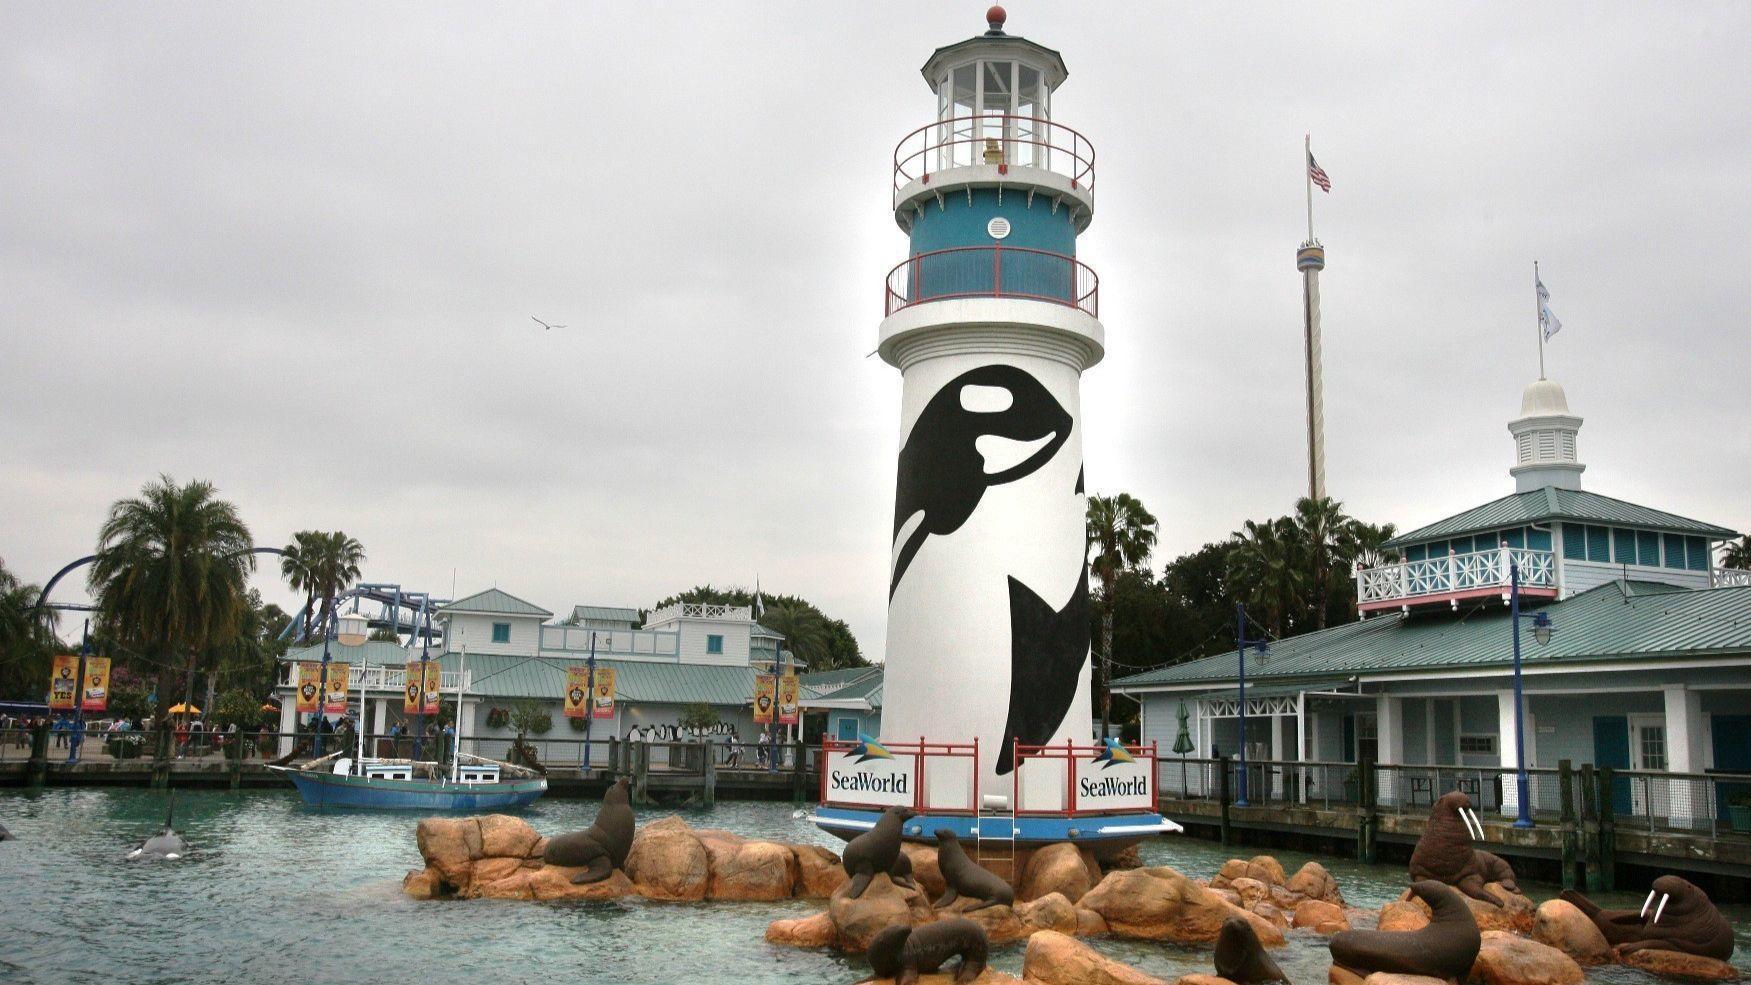 SeaWorld cuts 125 jobs, plans restructuring